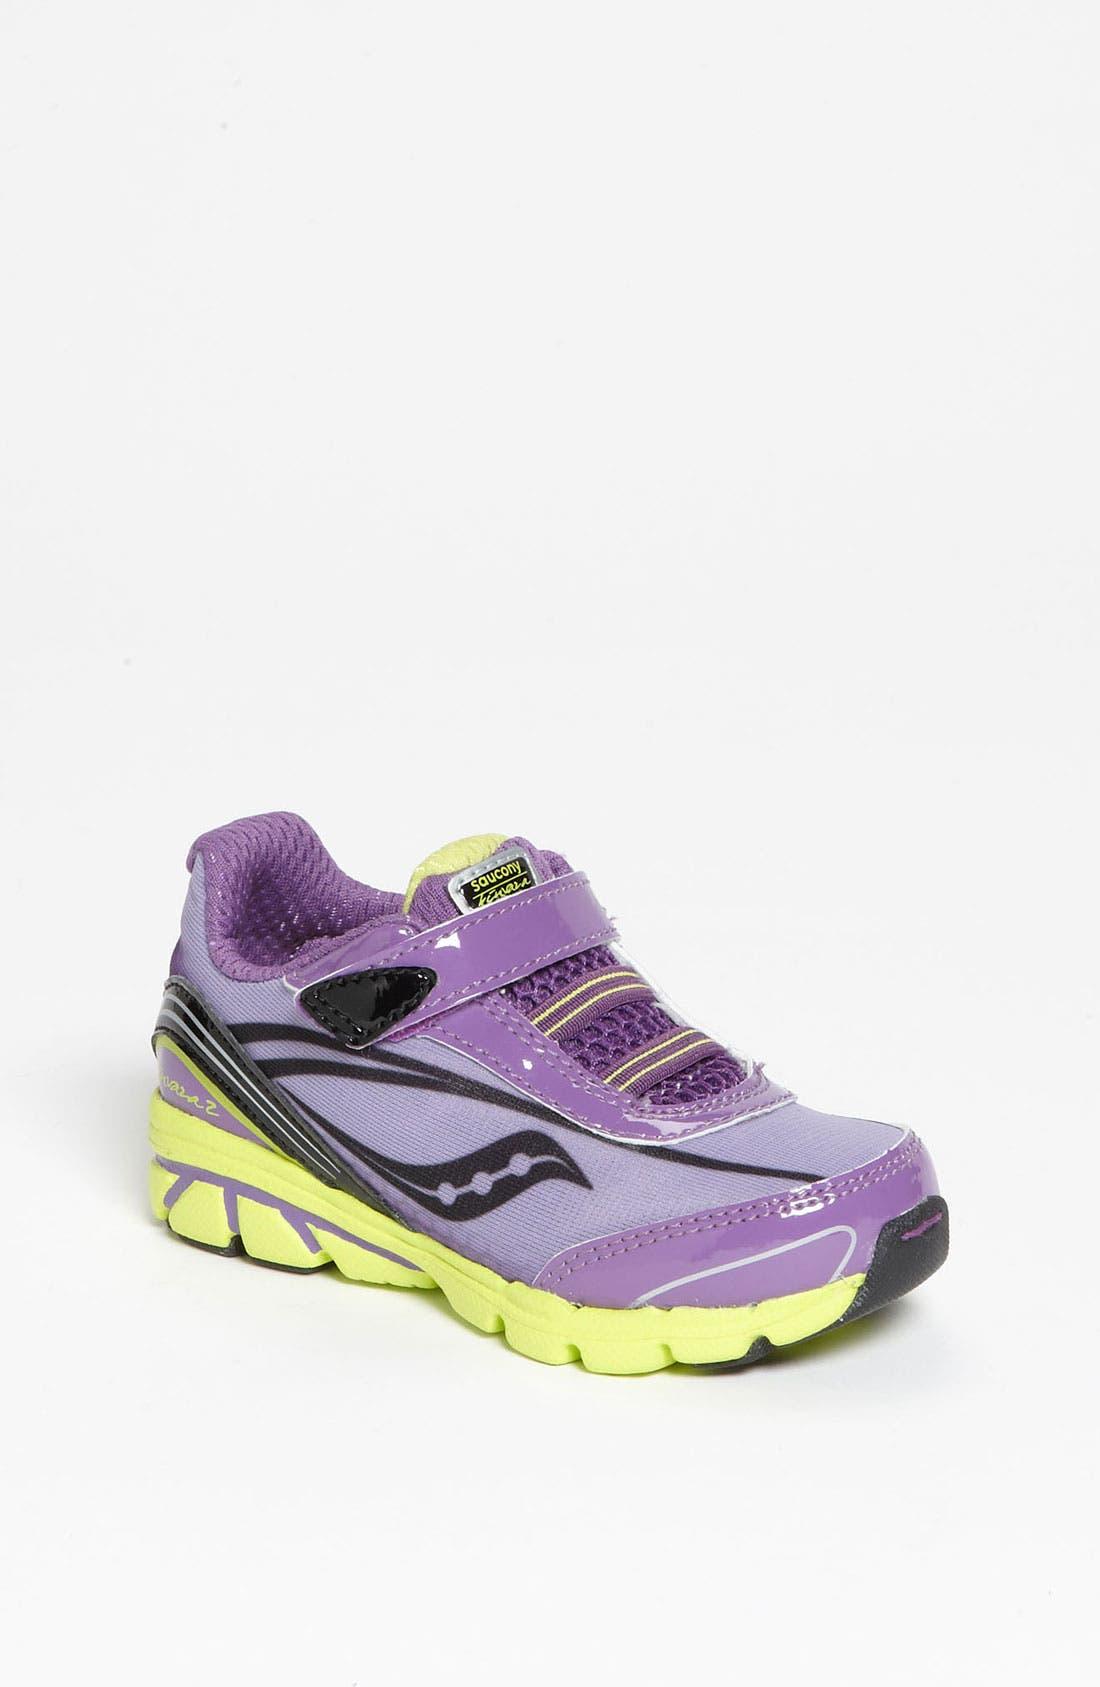 Alternate Image 1 Selected - Saucony 'Kinvara 2' Athletic Shoe (Baby, Walker & Toddler)